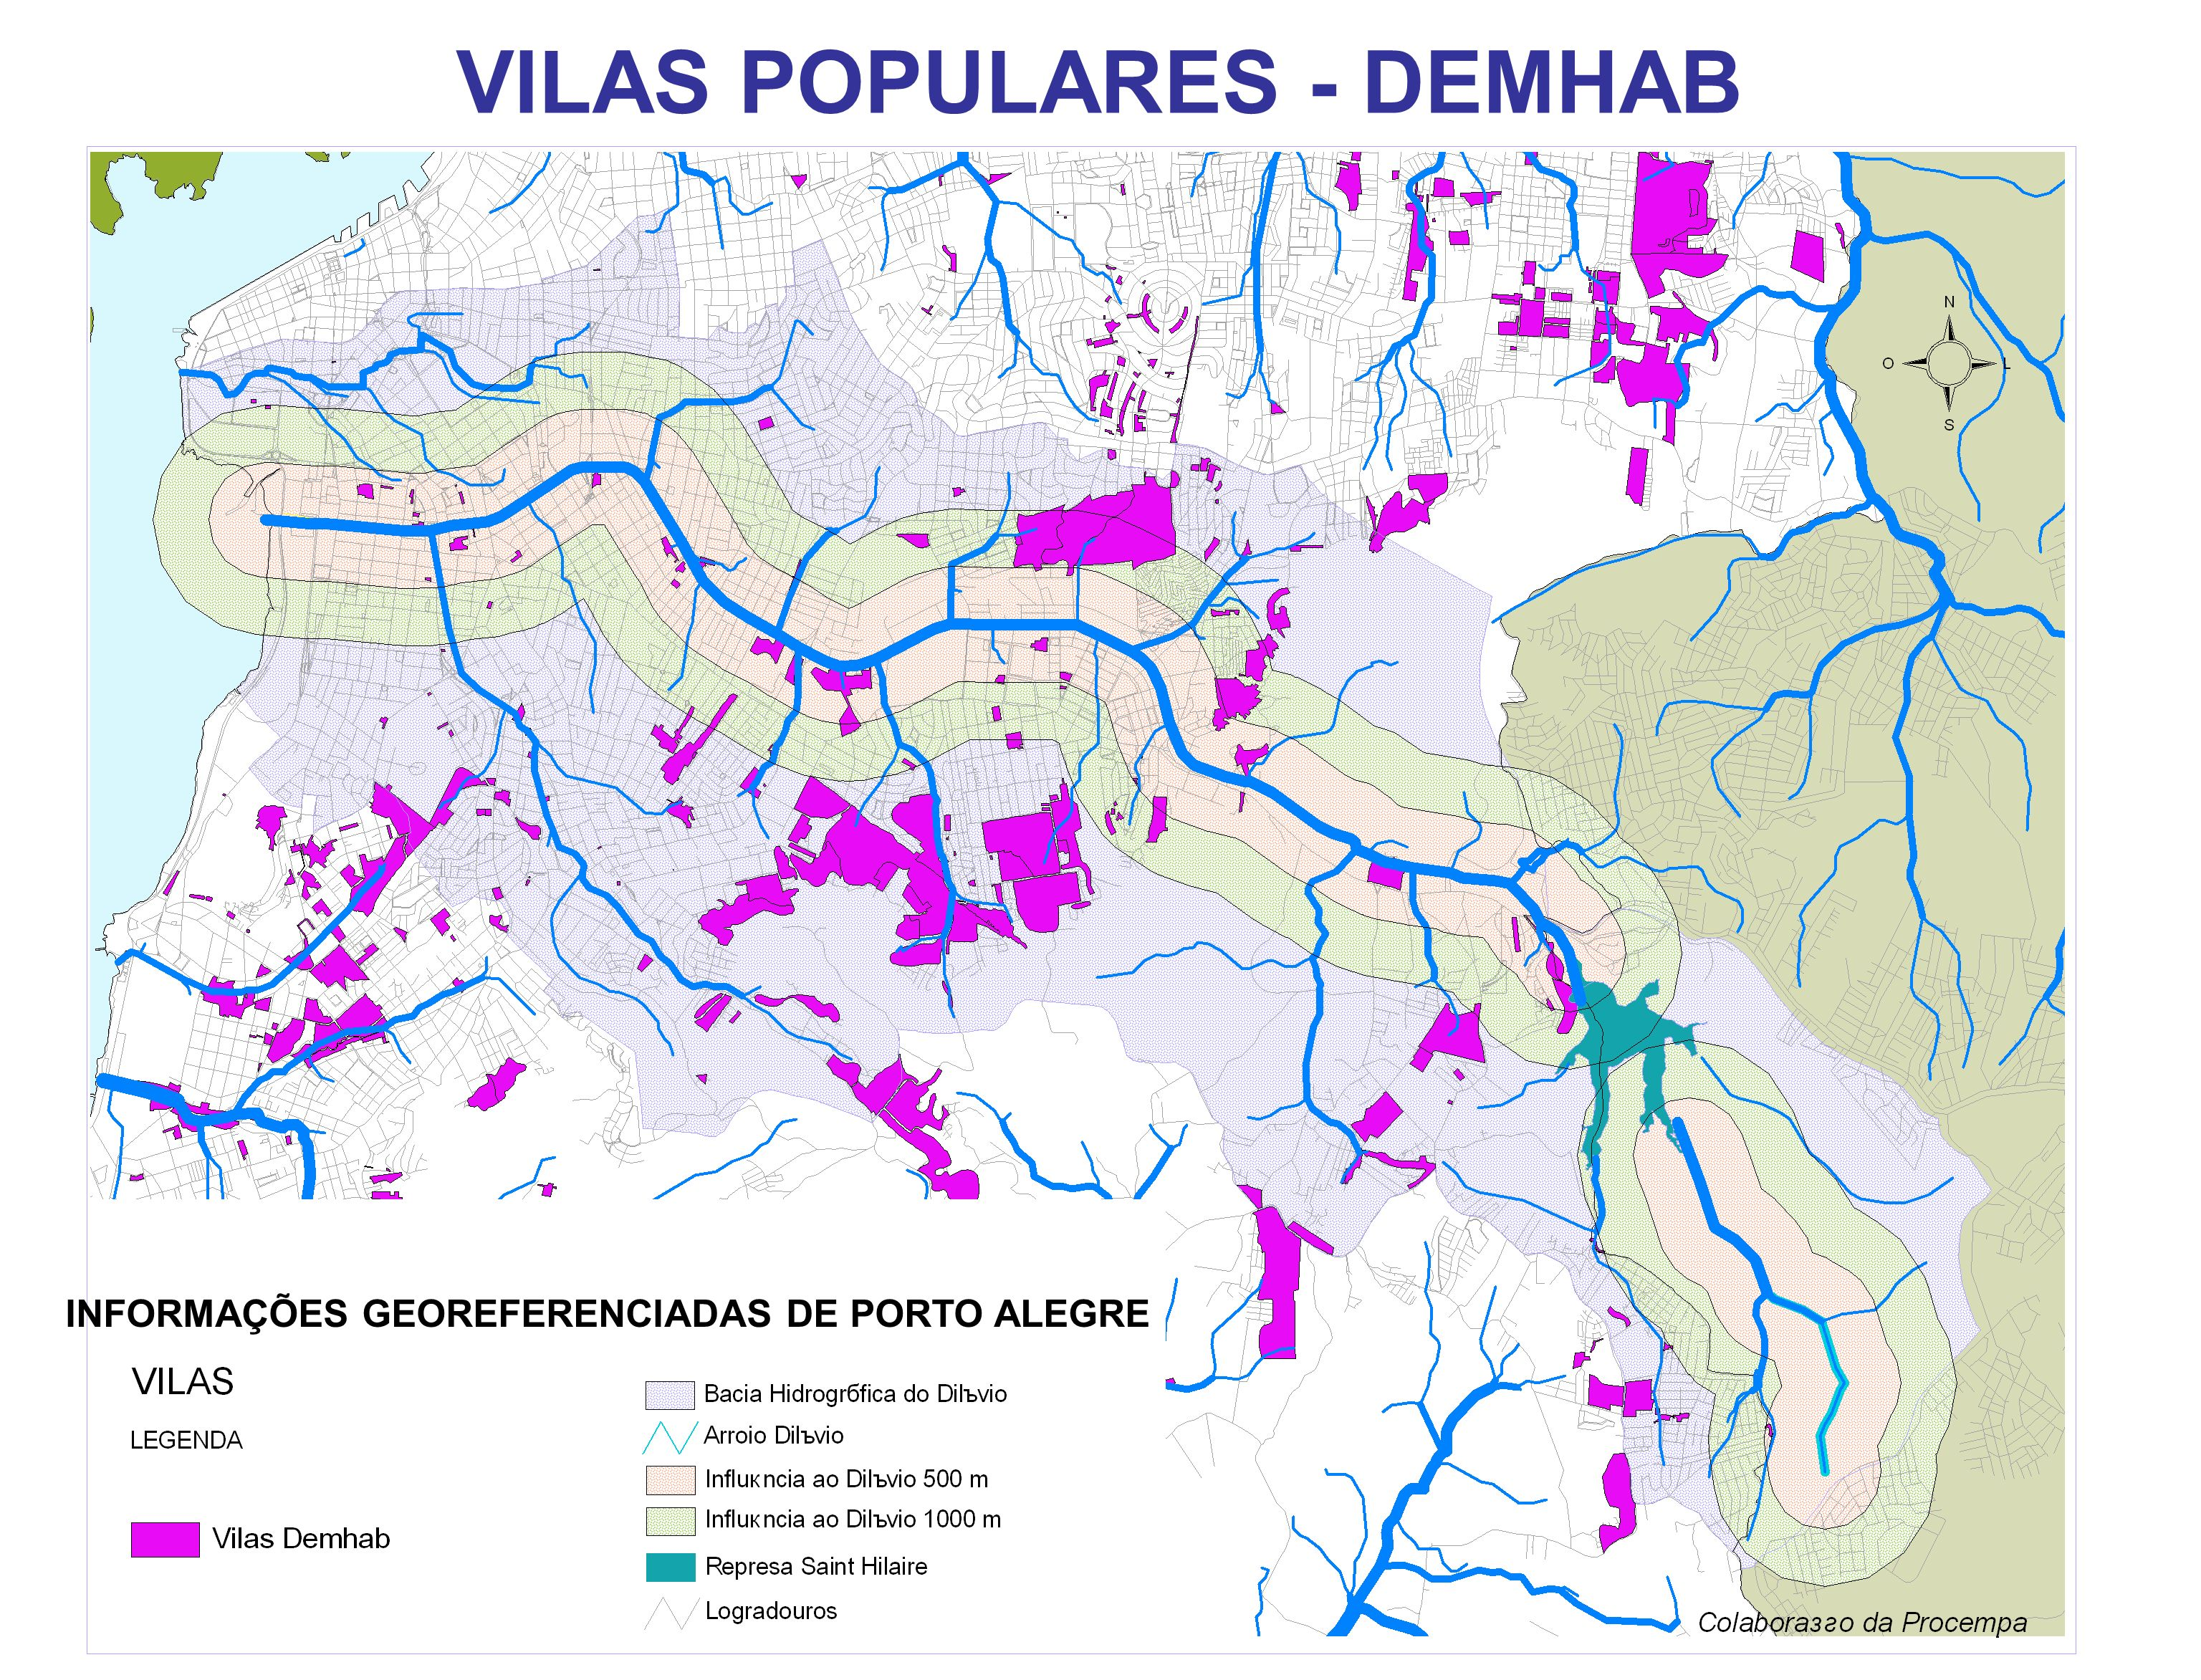 VILAS POPULARES - DEMHAB